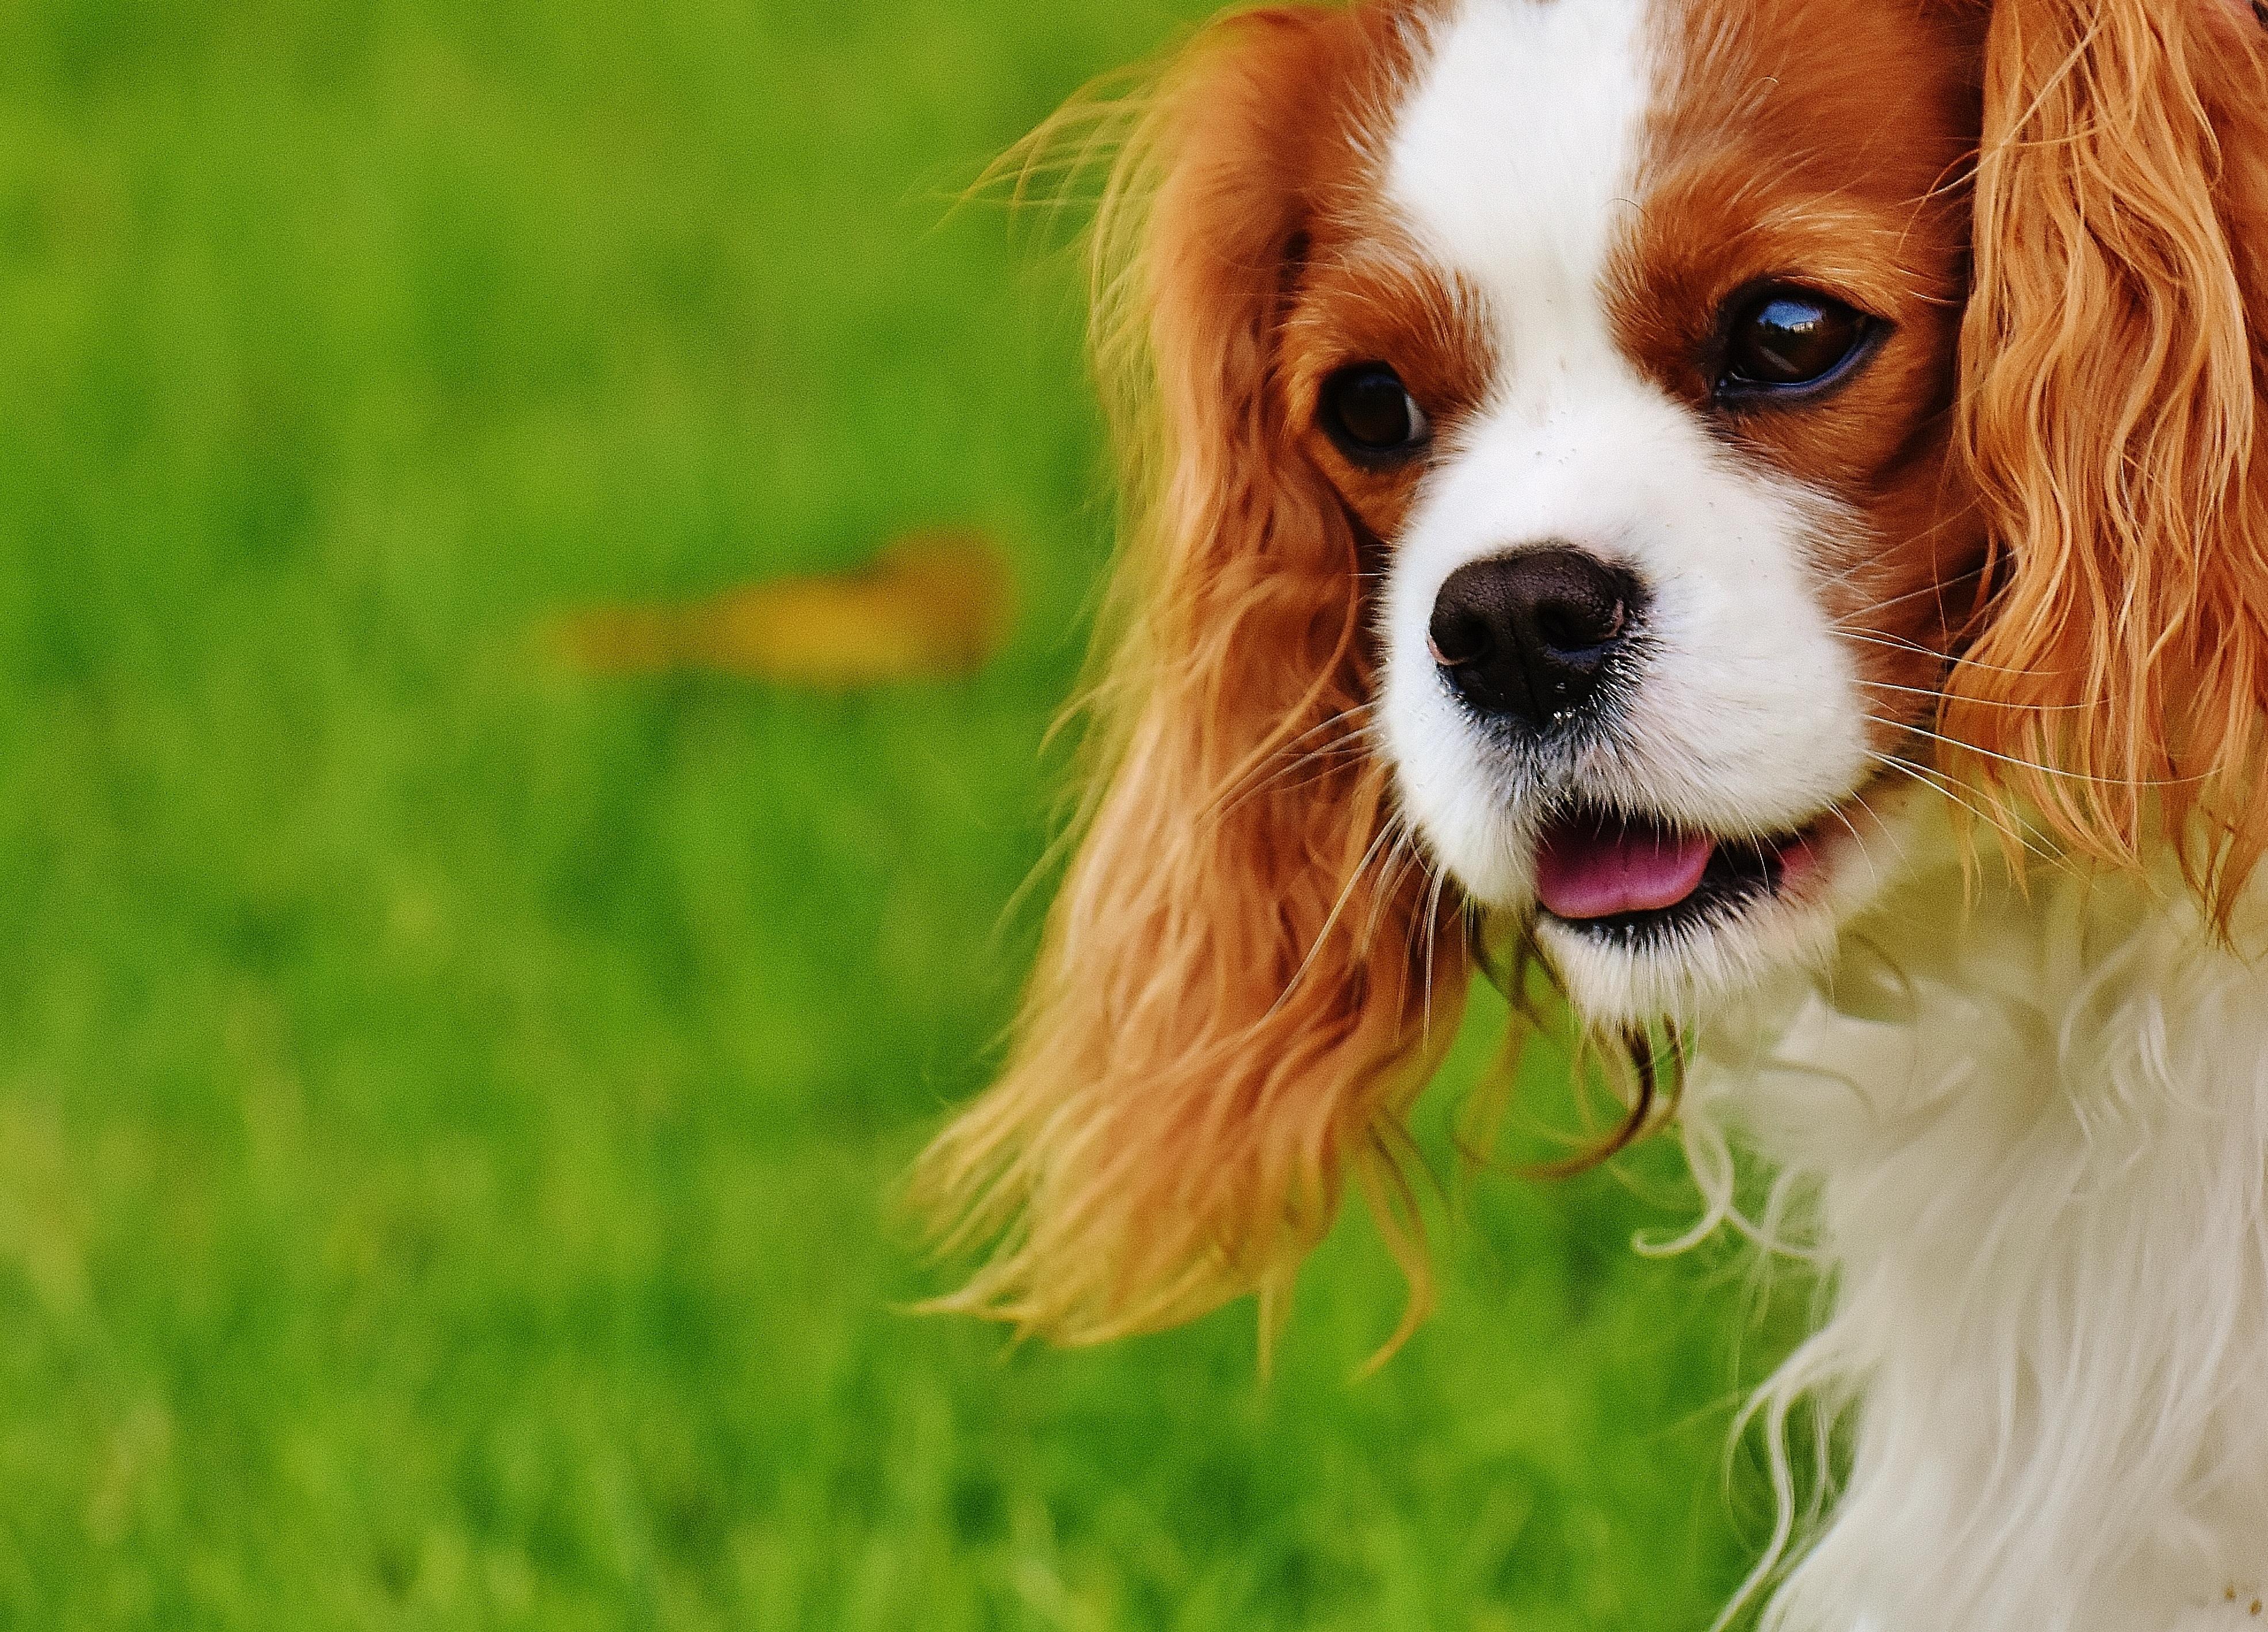 Download Charles Spaniel Brown Adorable Dog - white-dog-animal-cute-pet-fur-brown-mammal-spaniel-vertebrate-funny-dog-breed-cavalier-king-charles-spaniel-king-charles-spaniel-dog-like-mammal-kooikerhondje-cavachon-phalene-539739  Best Photo Reference_431462  .jpg